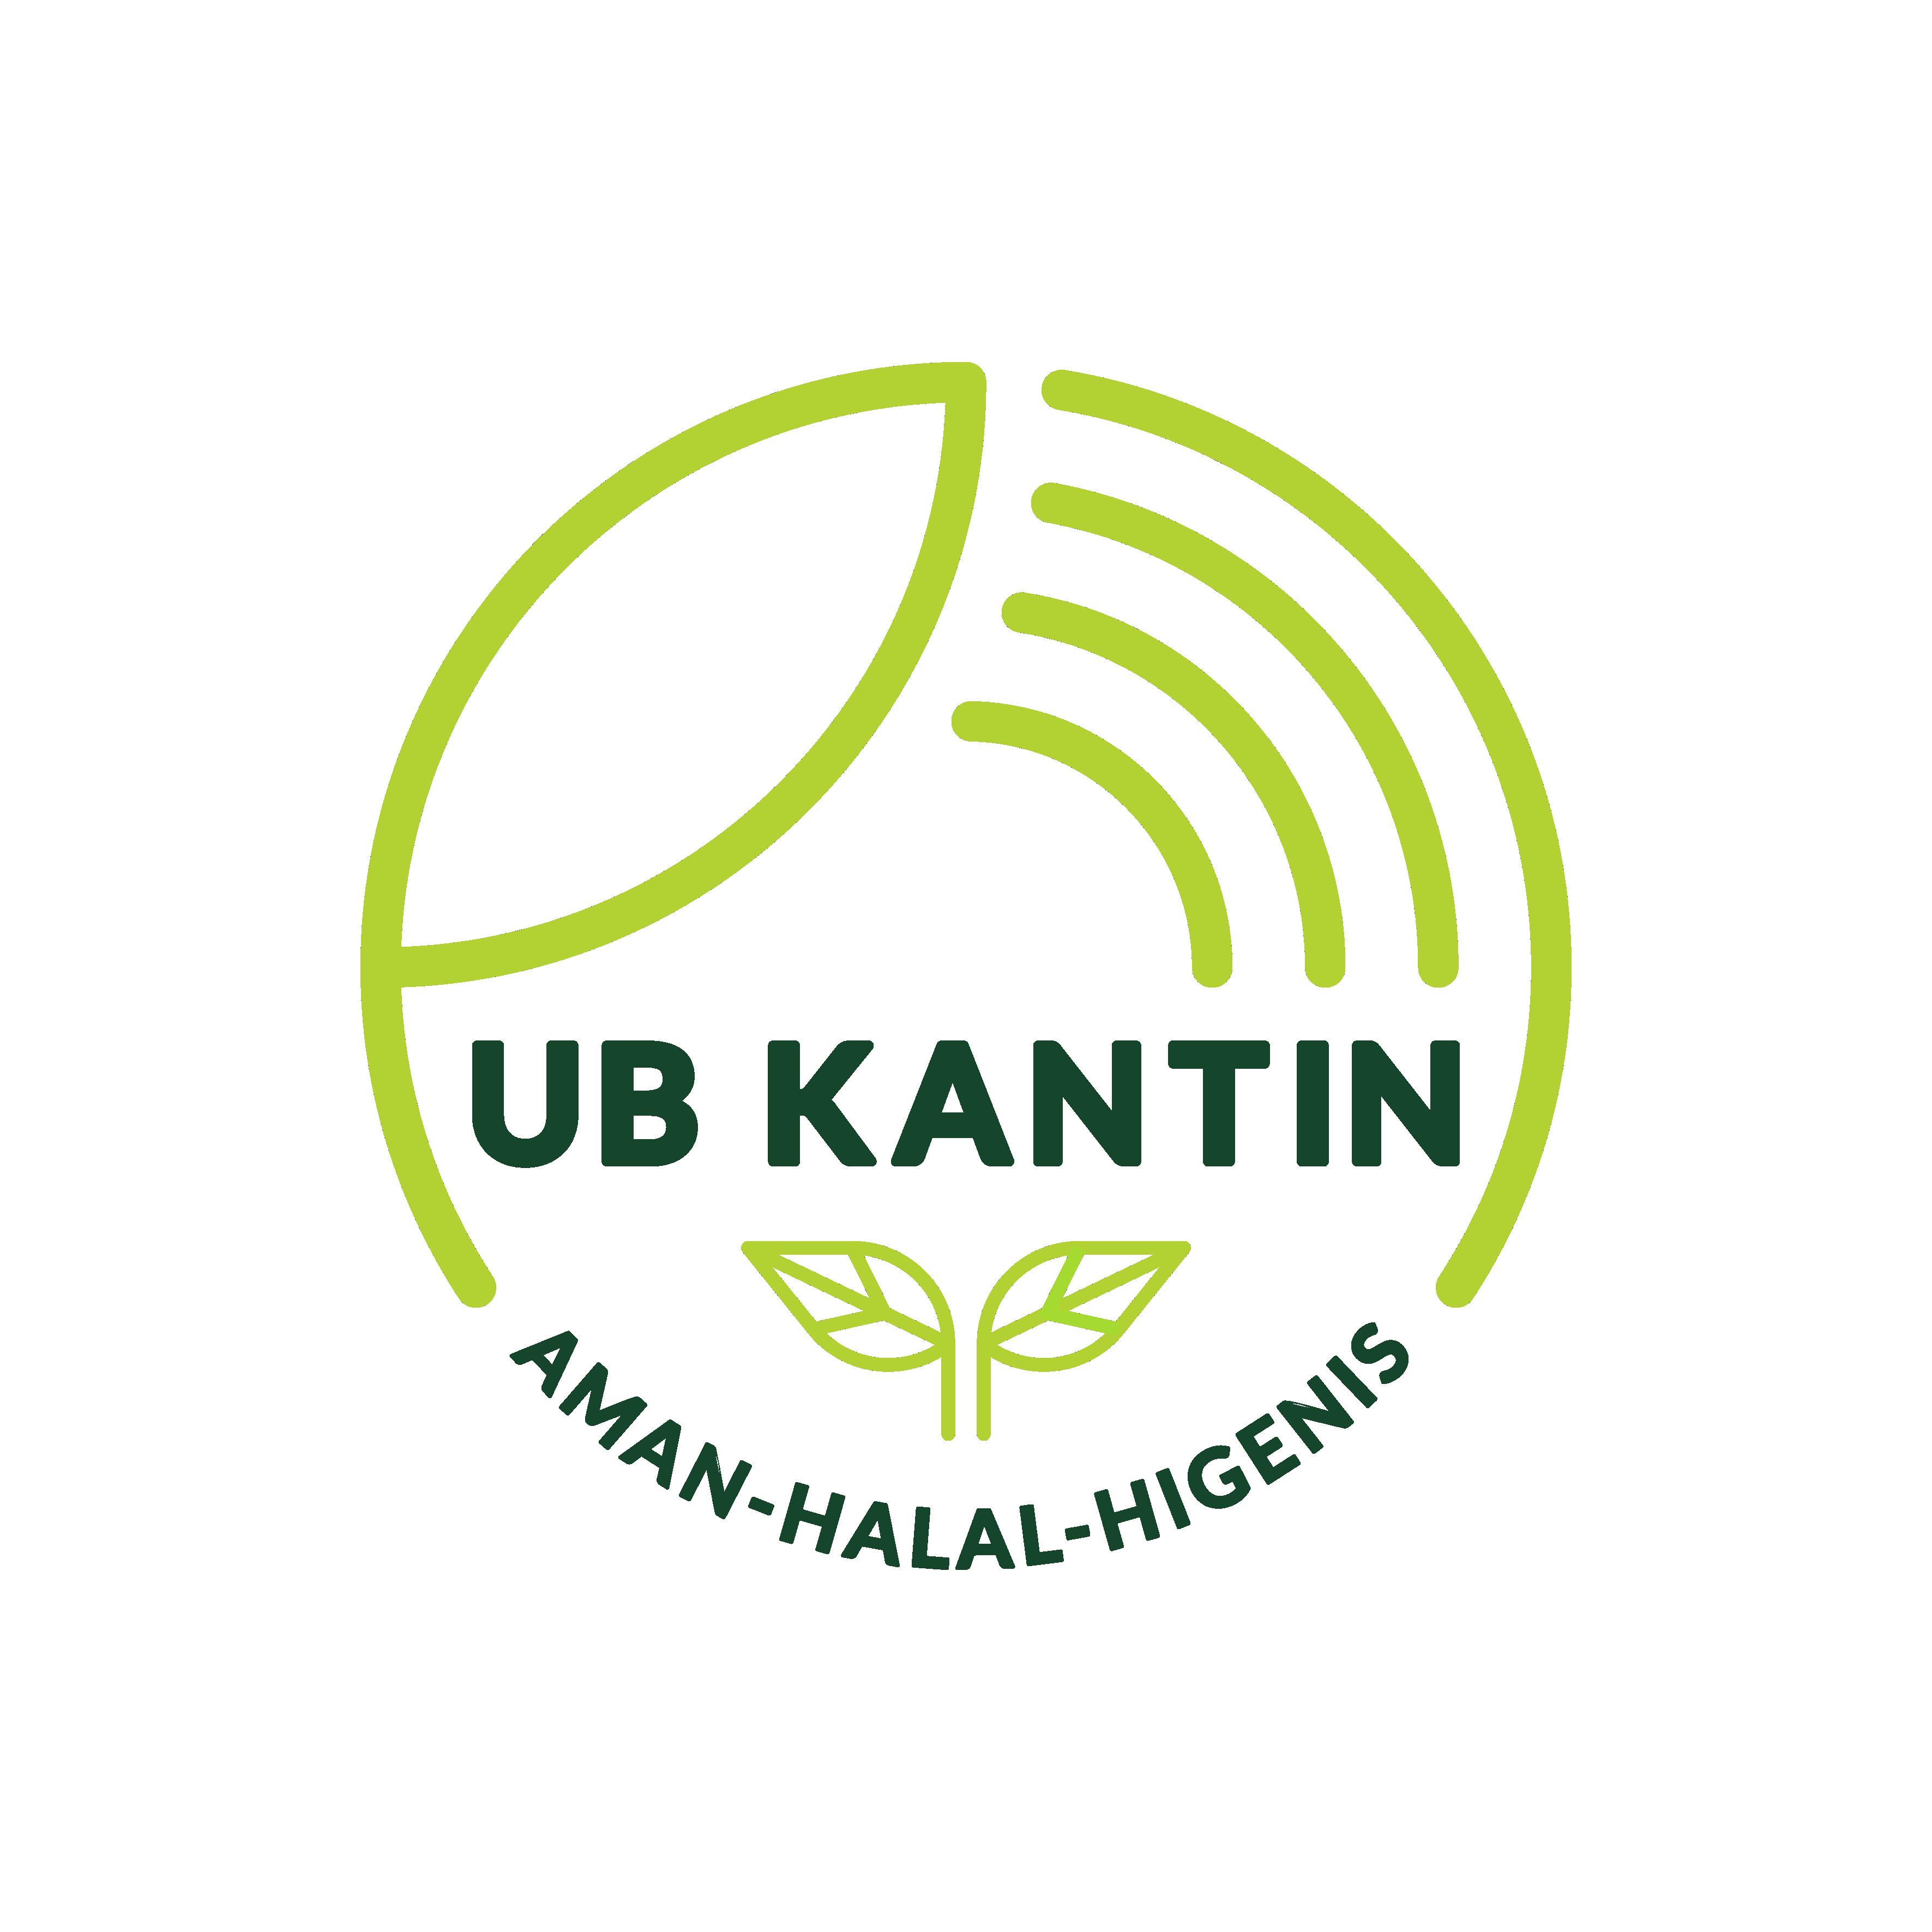 UB Kantin